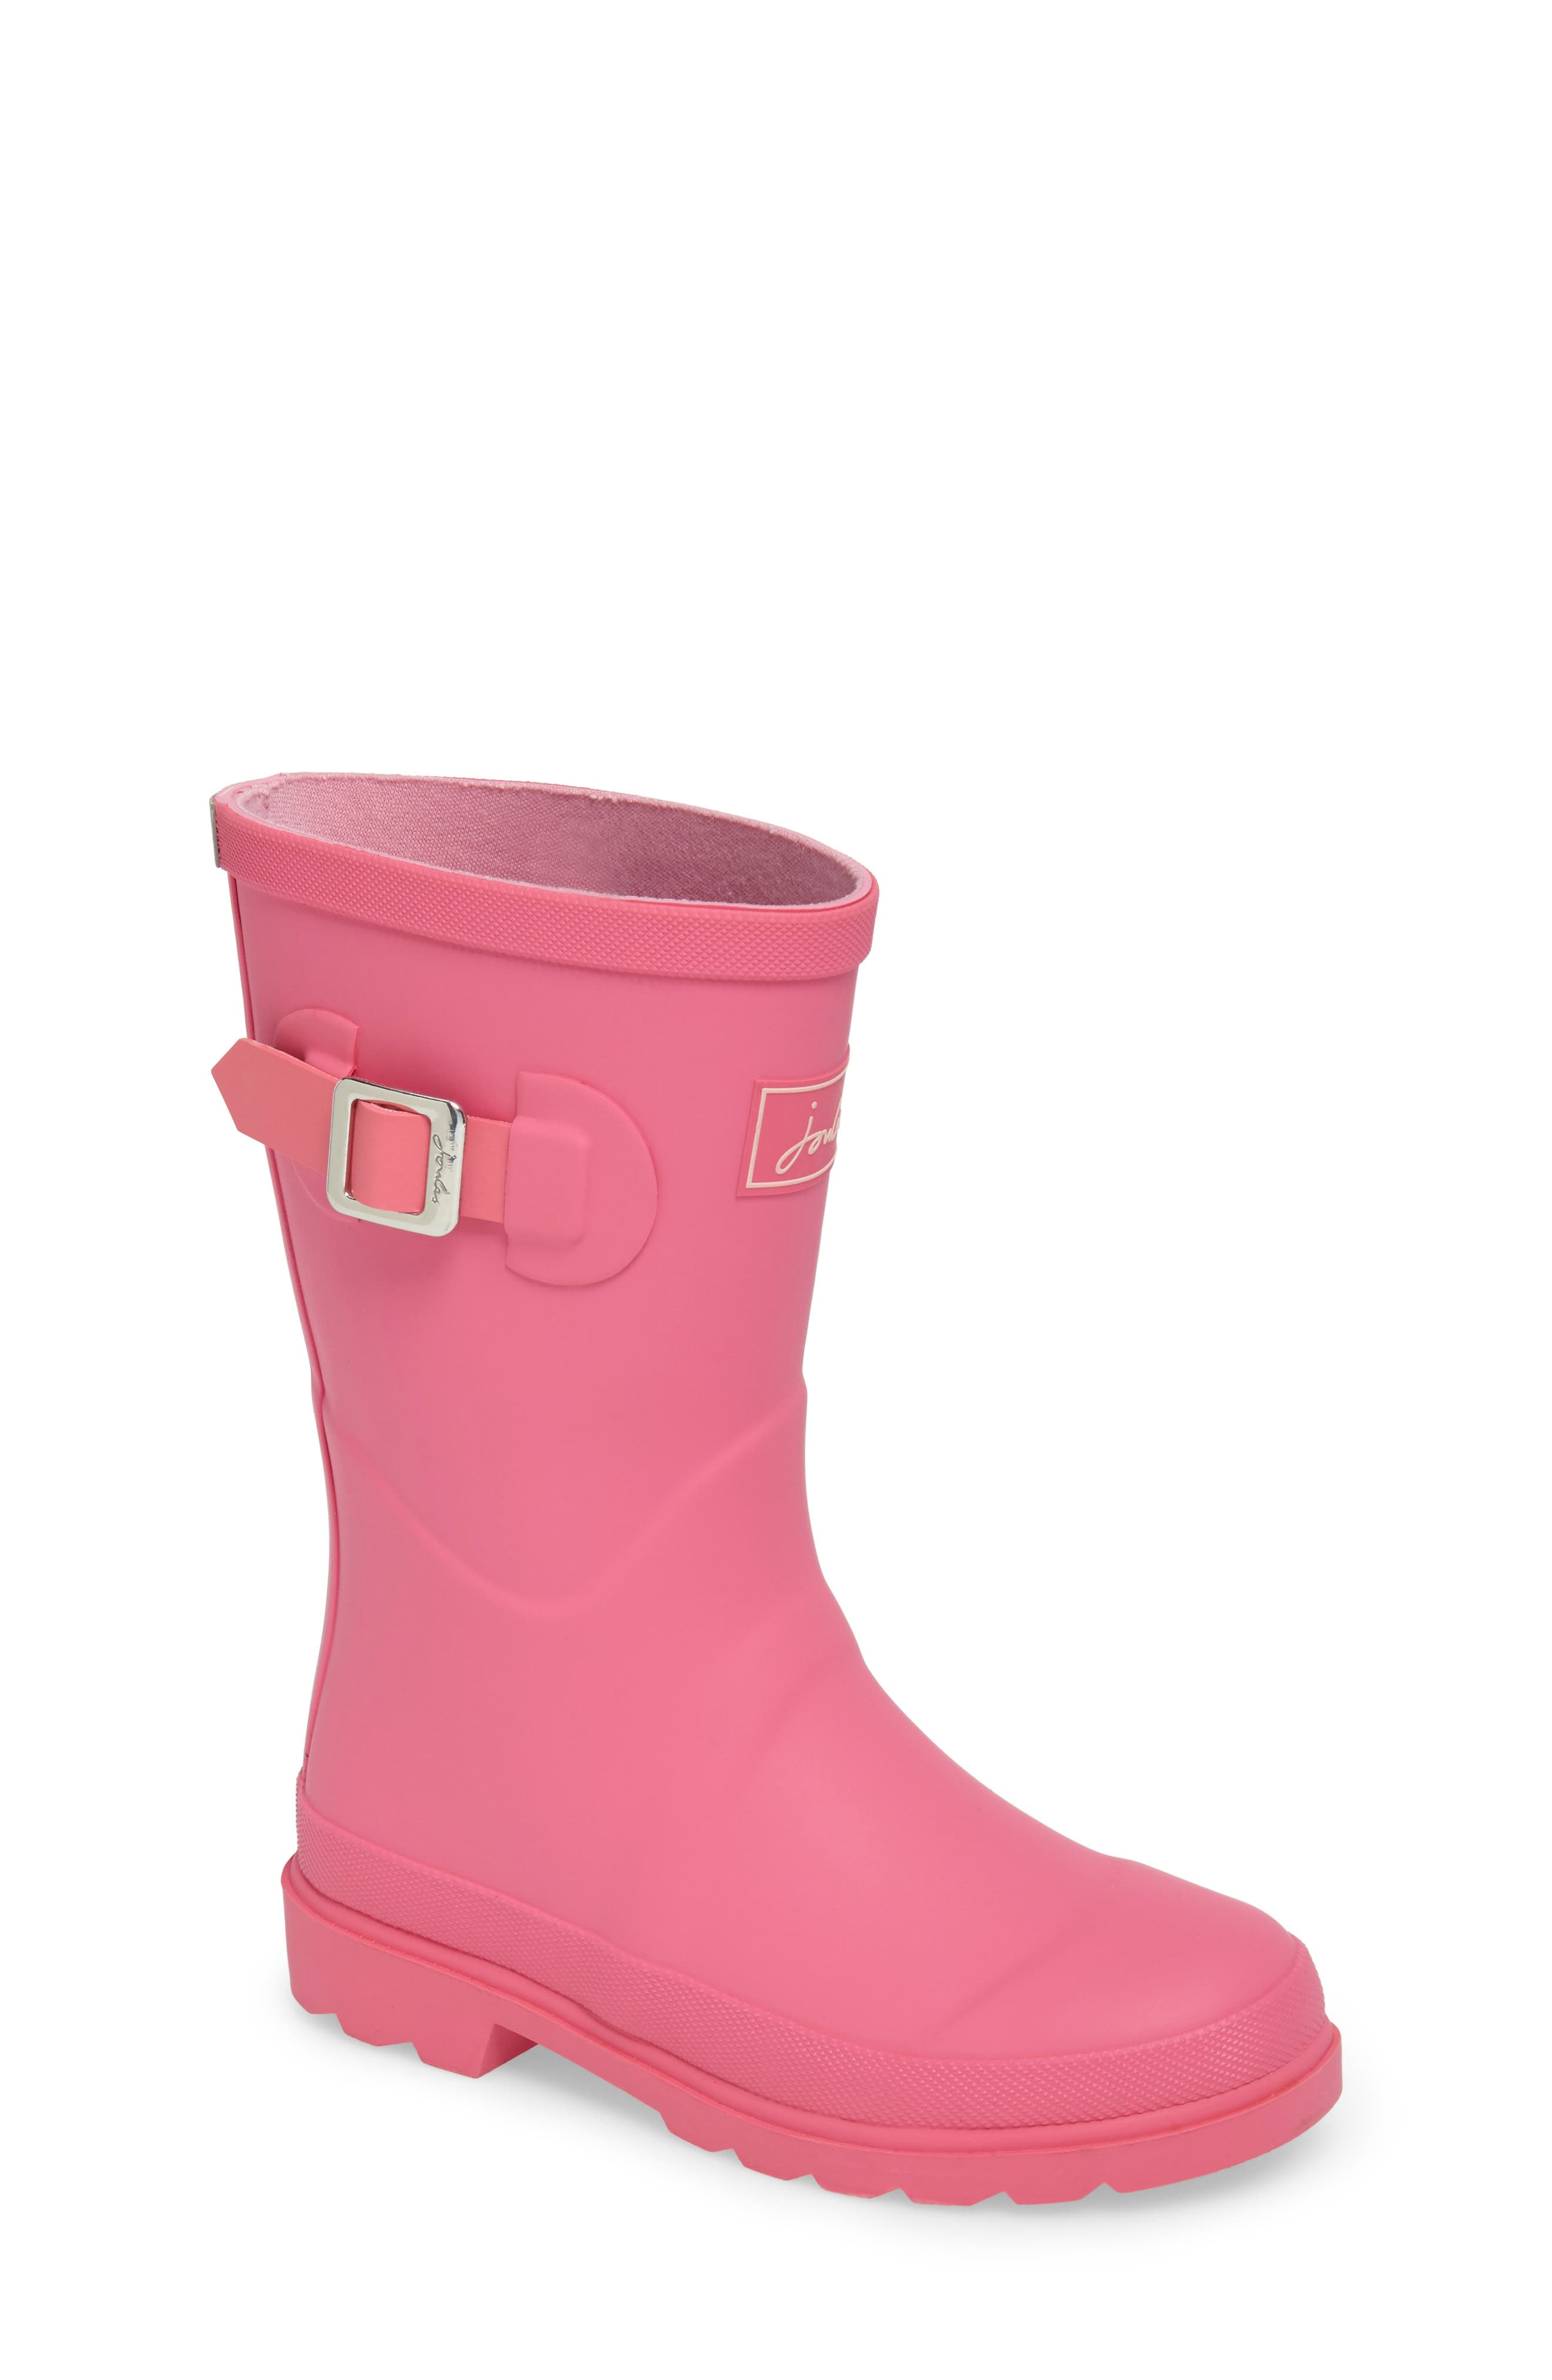 Alternate Image 1 Selected - Joules Welly Matte Waterproof Rain Boot (Toddler, Little Kid & Big Kid)